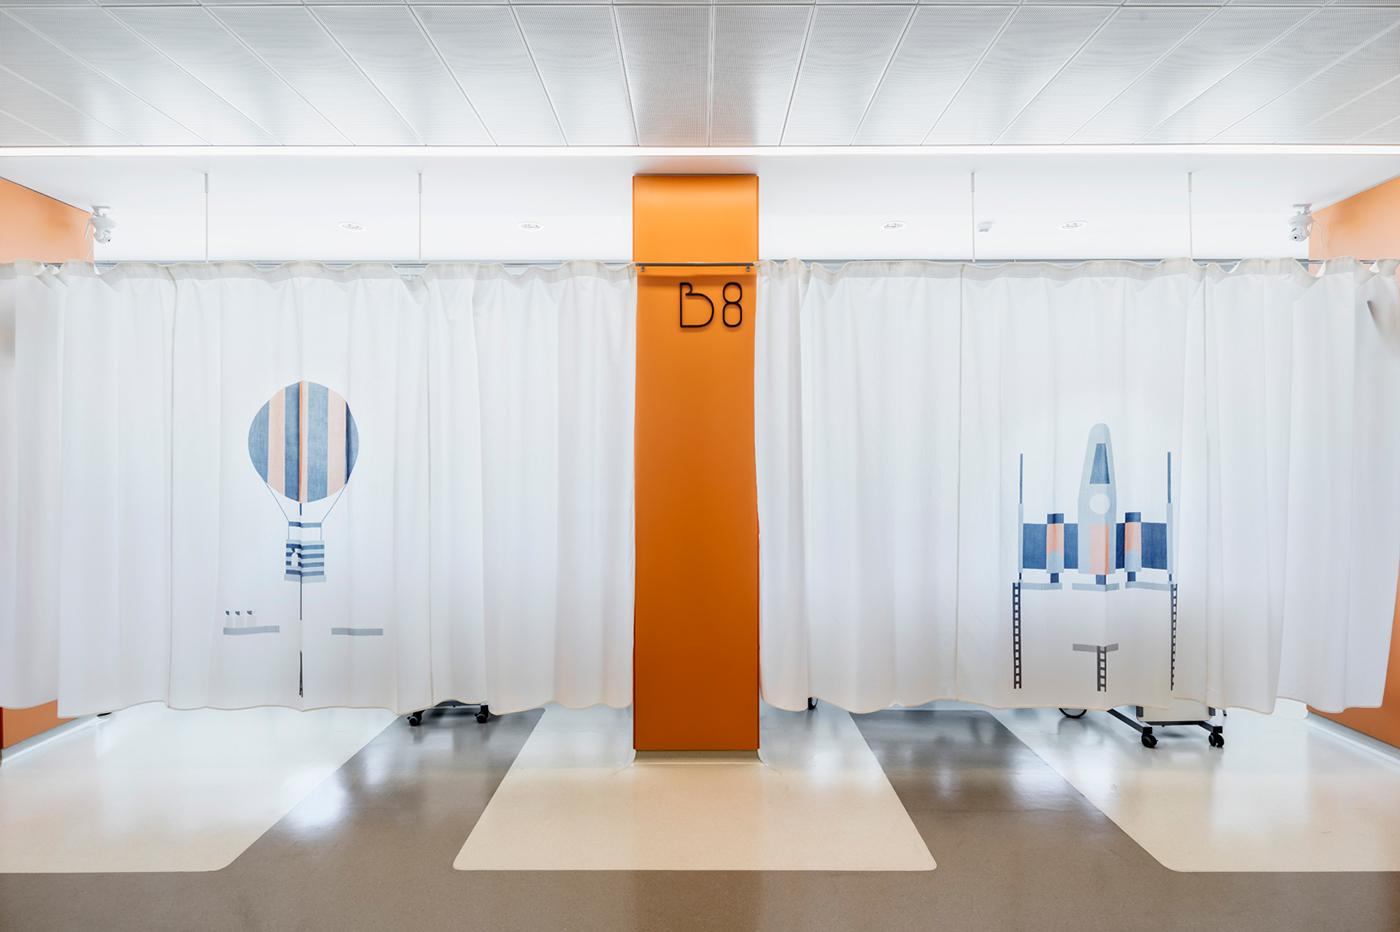 rgb_creative_ParcdAtencions_hospital_design_025